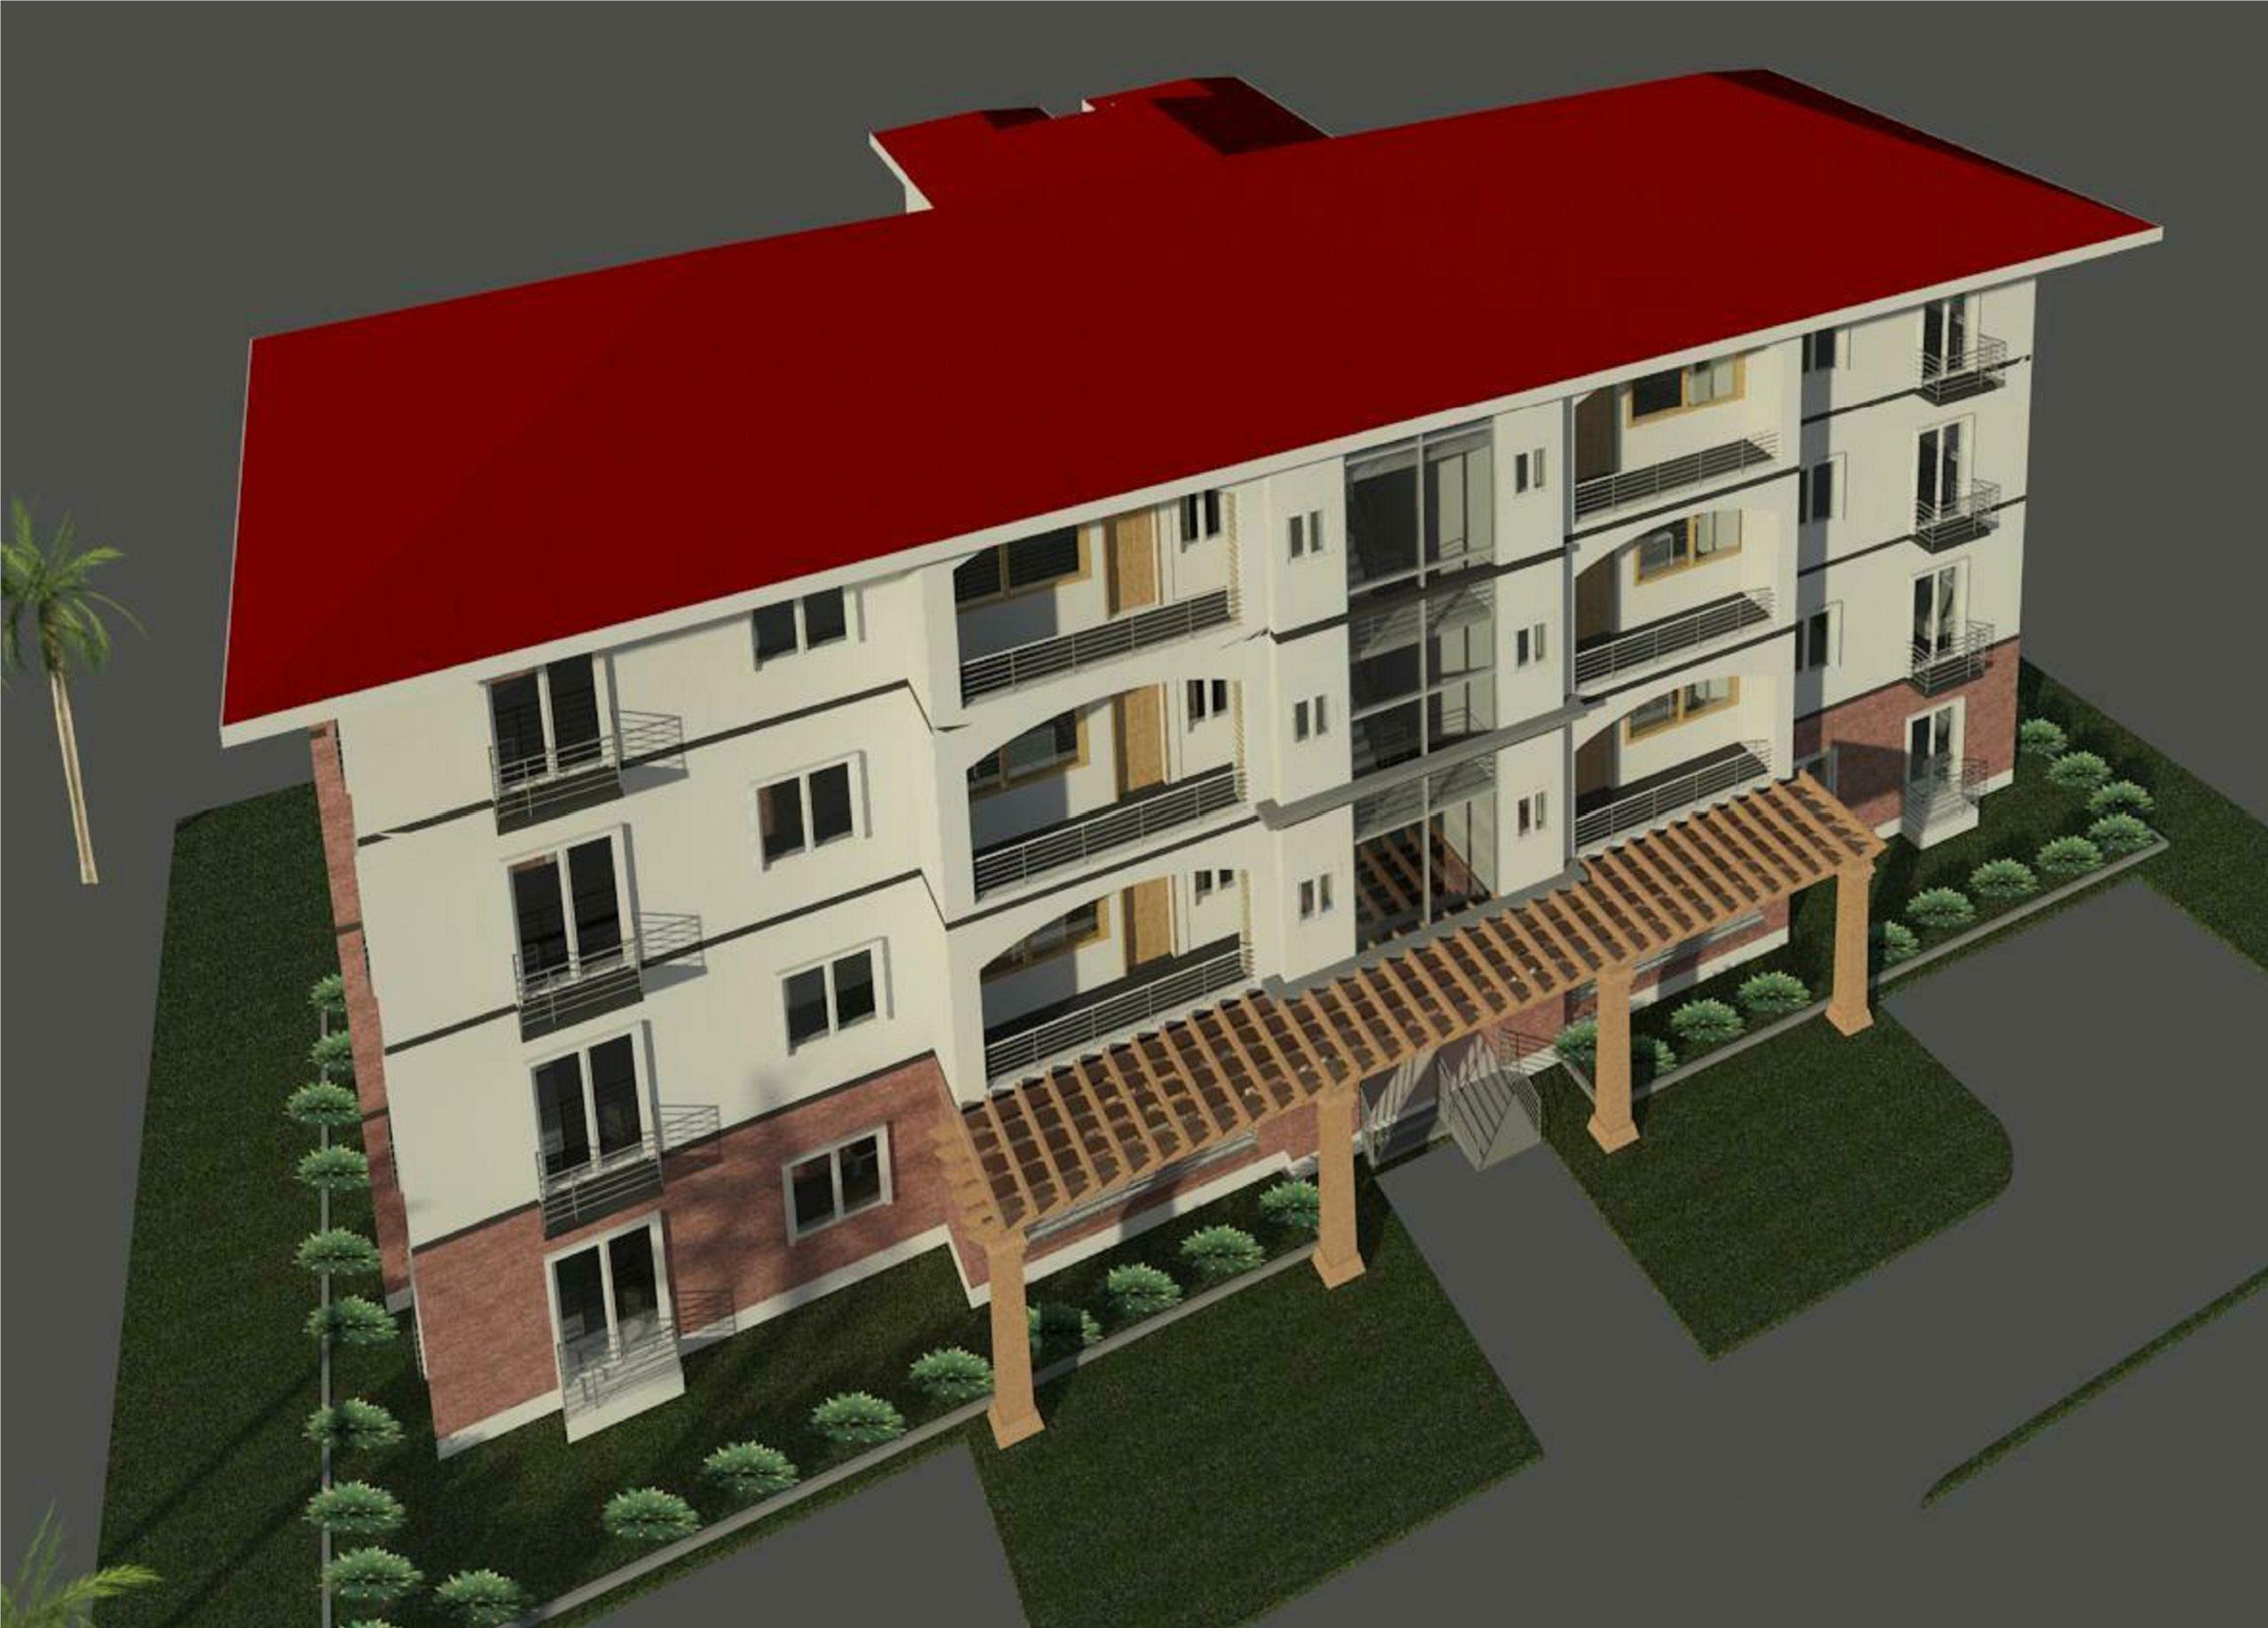 MAJ 1040 -02- 3 BEDROOM BLOCK OF FLATS - 4 FLRS - Rendering - 3D View 2_1